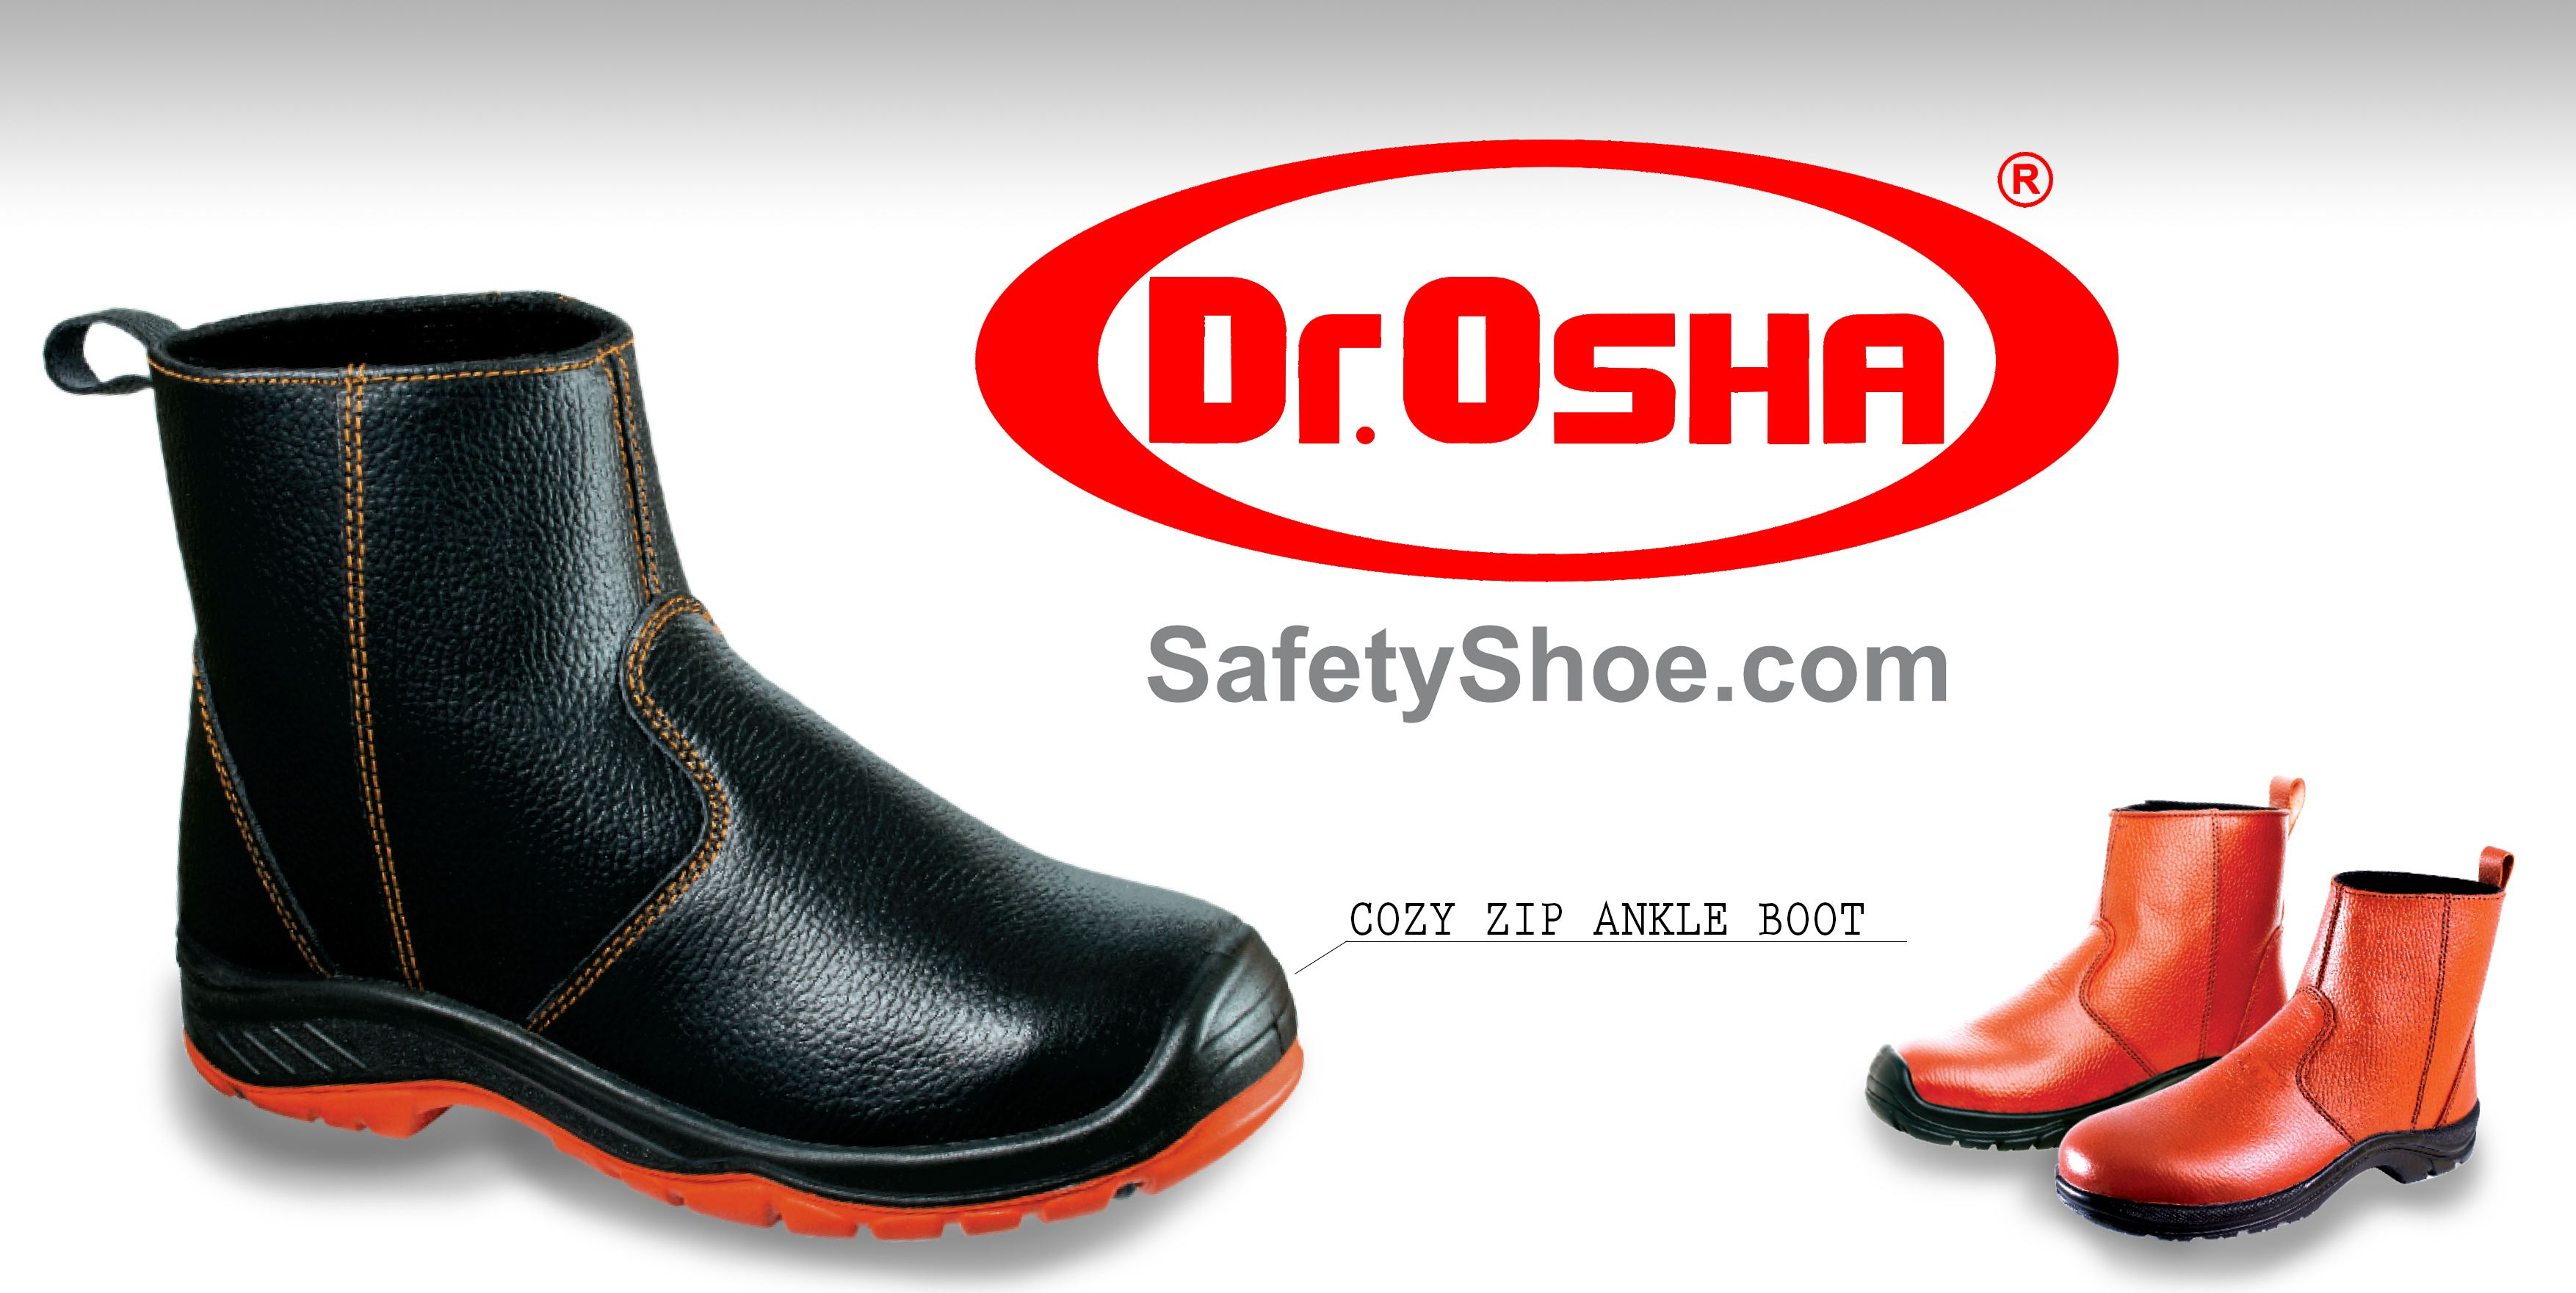 Dr Osha Safety Shoes Hero Straps 3188 Black Daftar Harga Terbaru Cheetah 7106ha Pin By Drosha